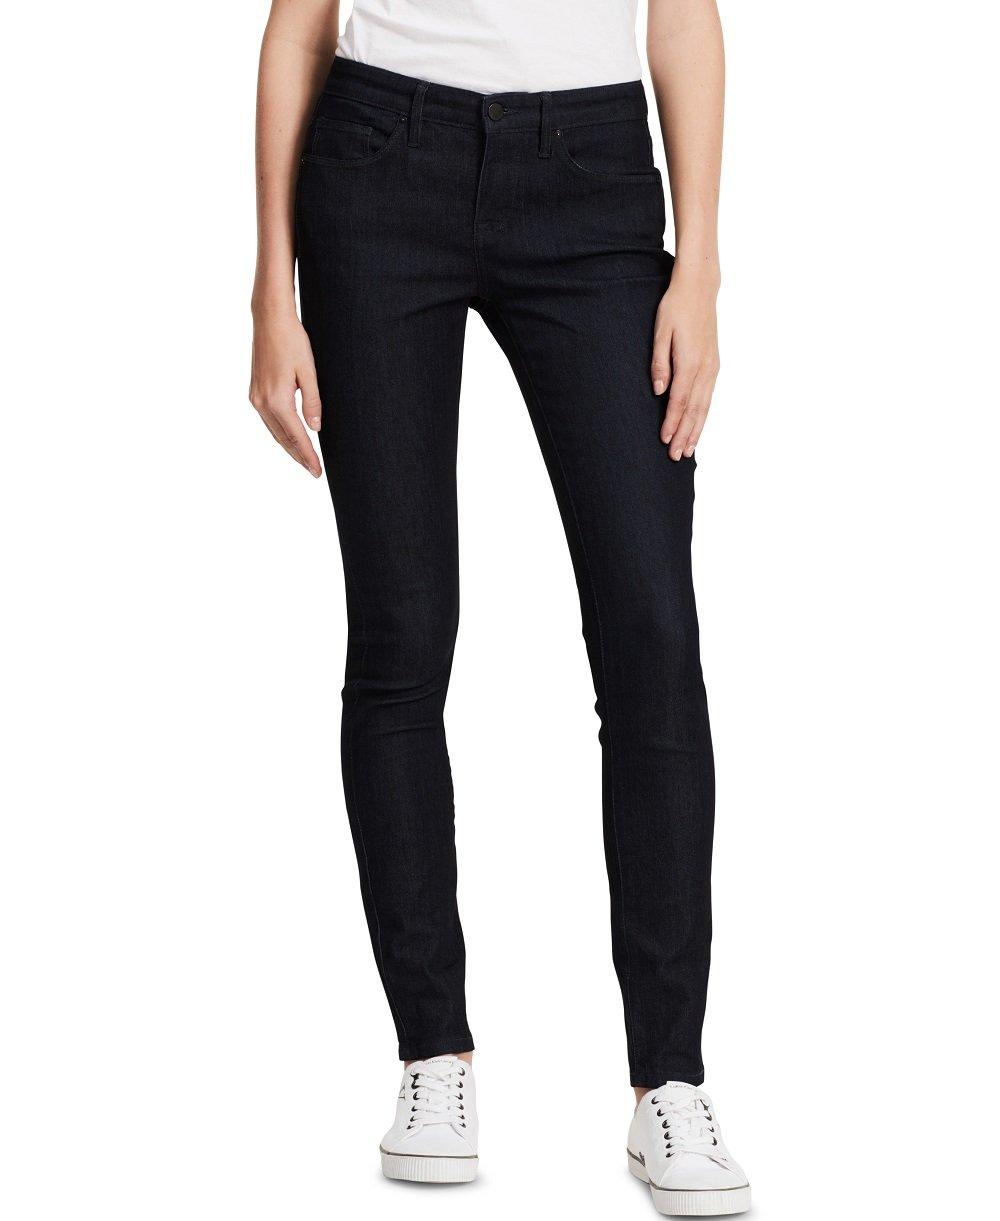 "Calvin Klein womens Curvy Skinny Jean, Rinse (77% Cotton/21% Polyester/2% Elastane), 4R 32"" Inseam"